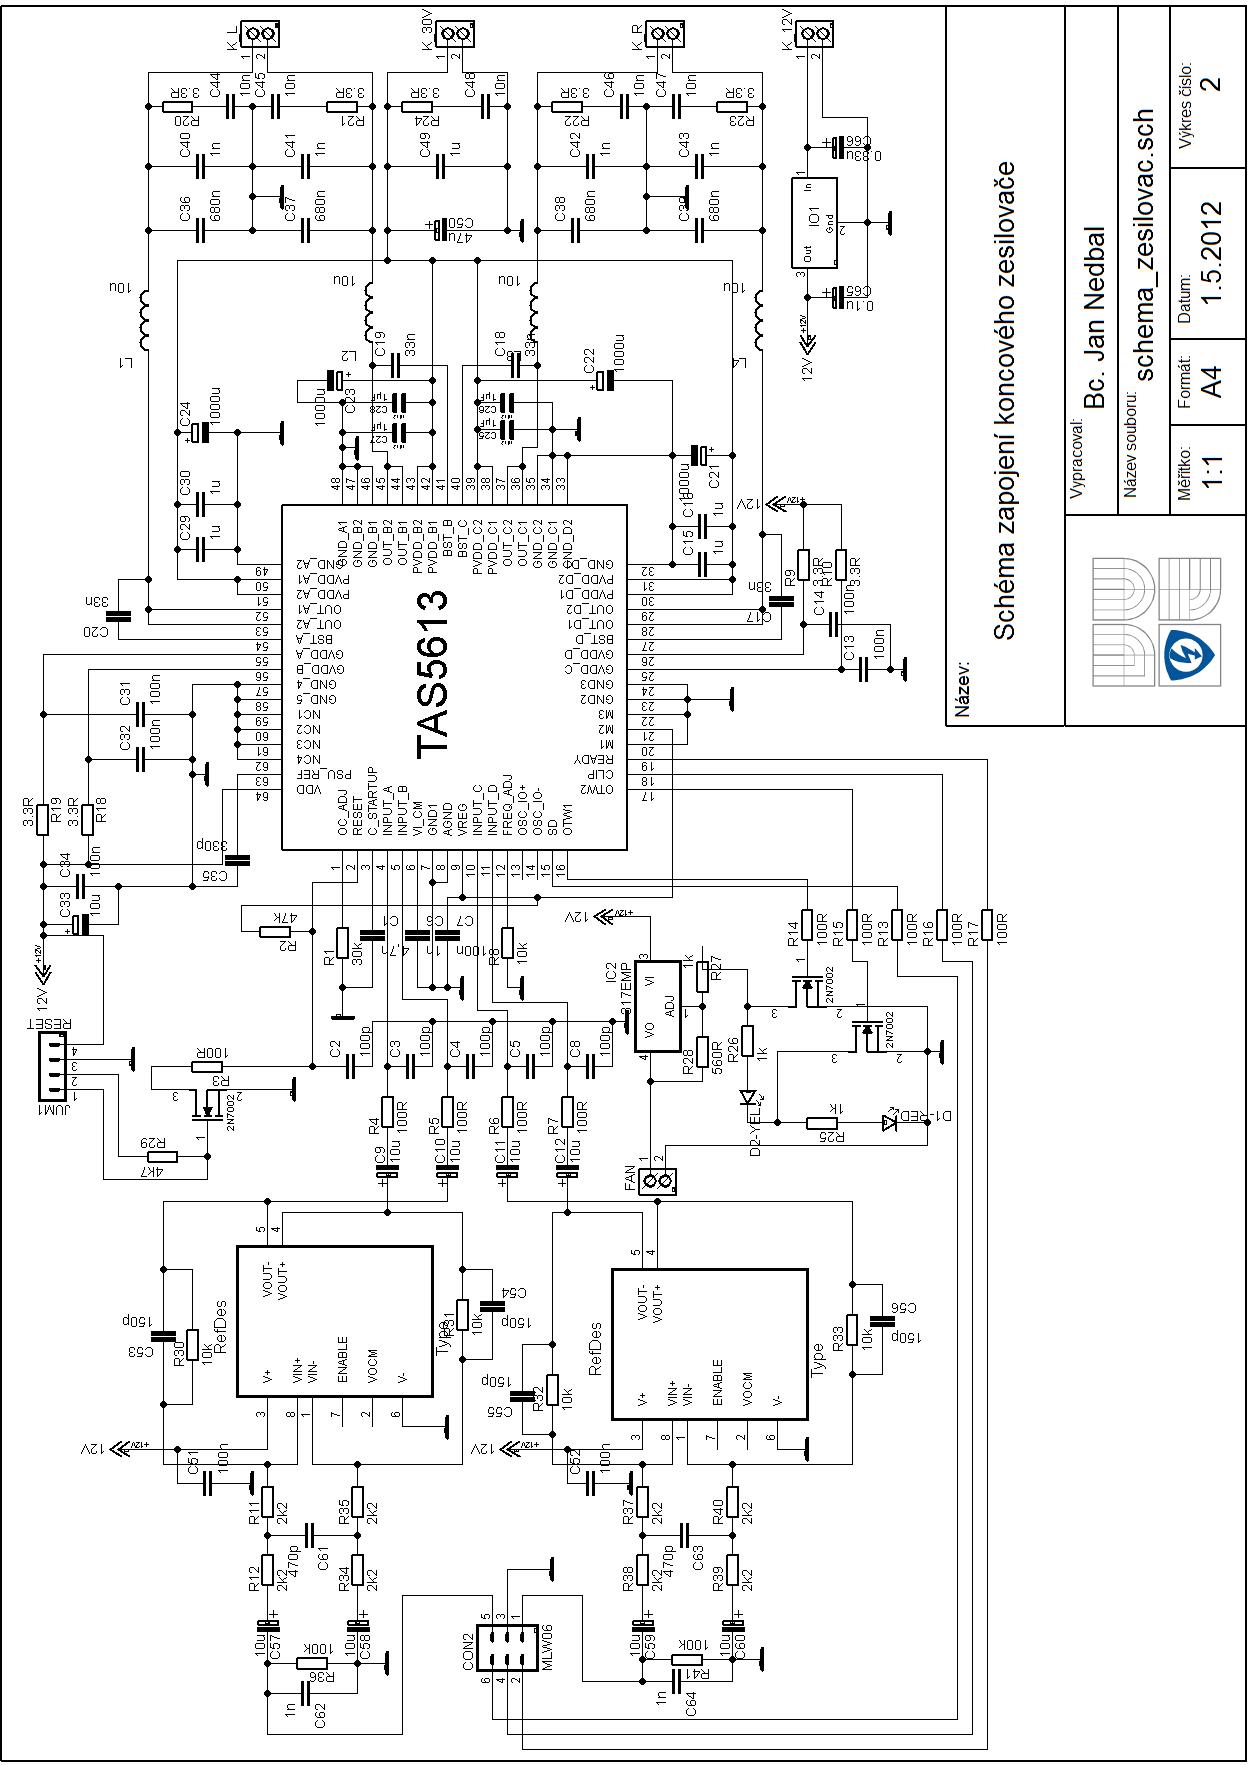 E70469 Wiring Diagram - Wiring Diagrams Datnielsenselinetrouwen.nl